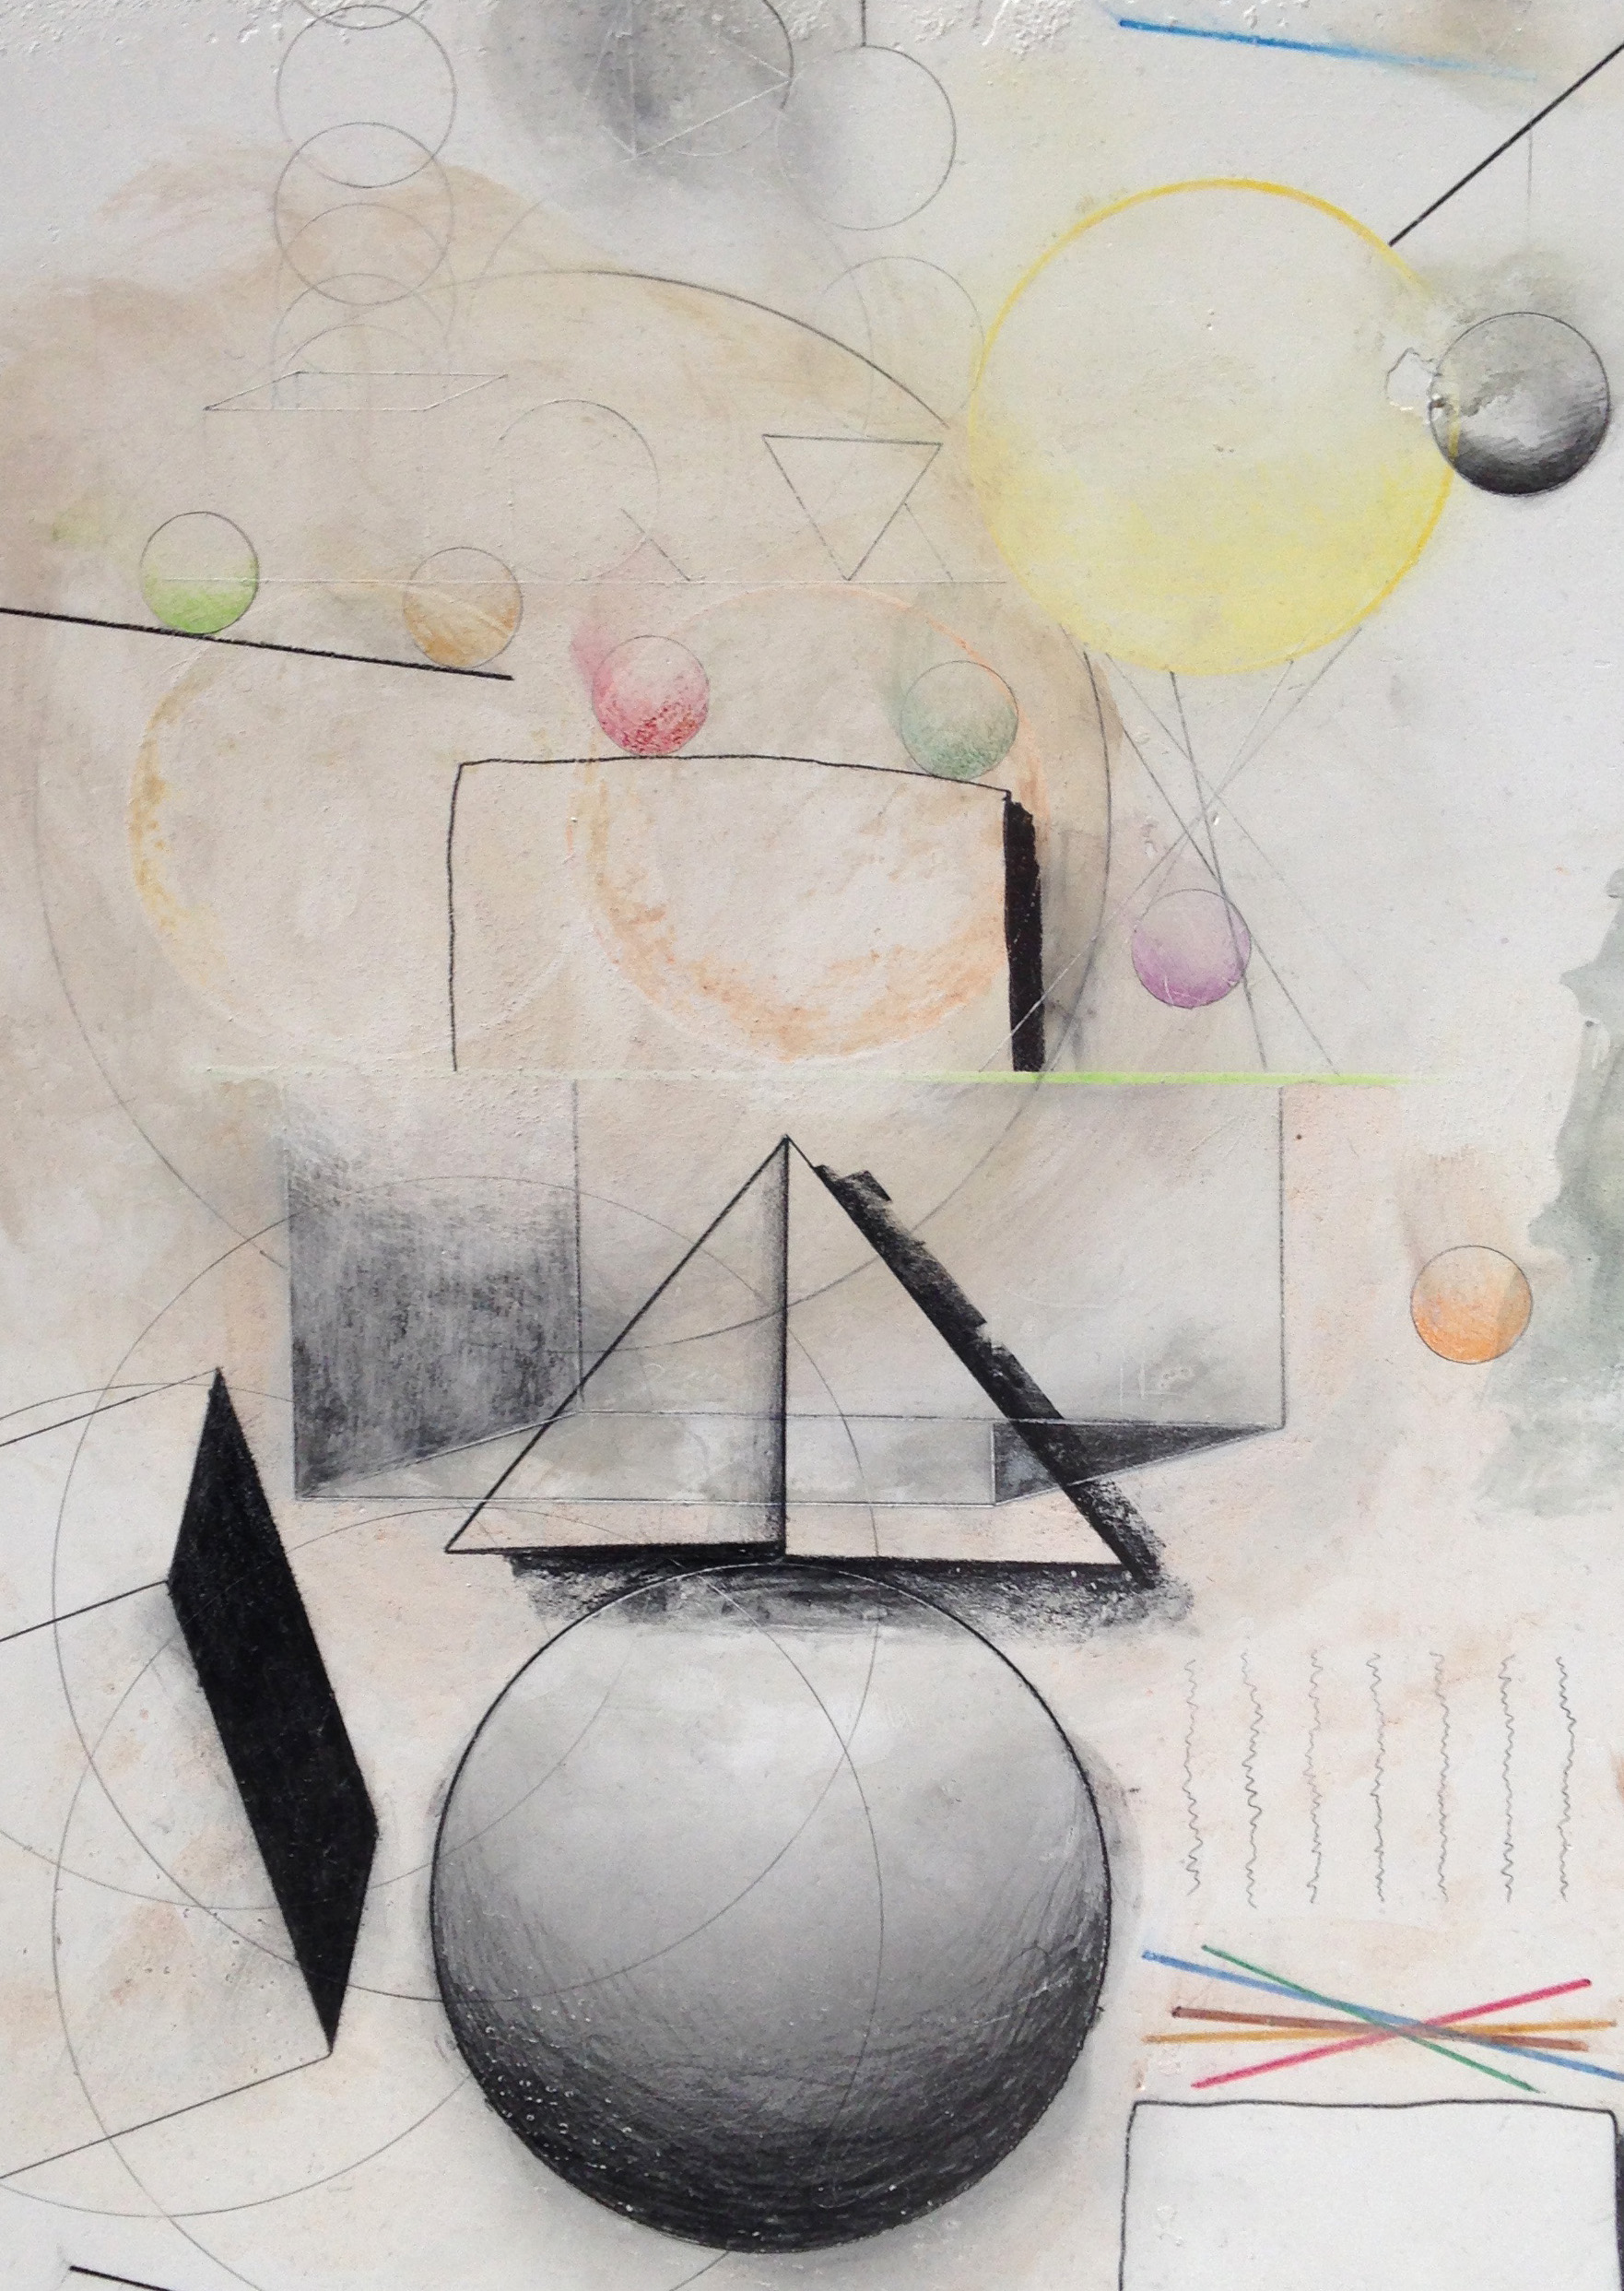 I, 2014, Pencil, coloured pencil and egg tempuraon plaster, 30.5 x 22.5cm